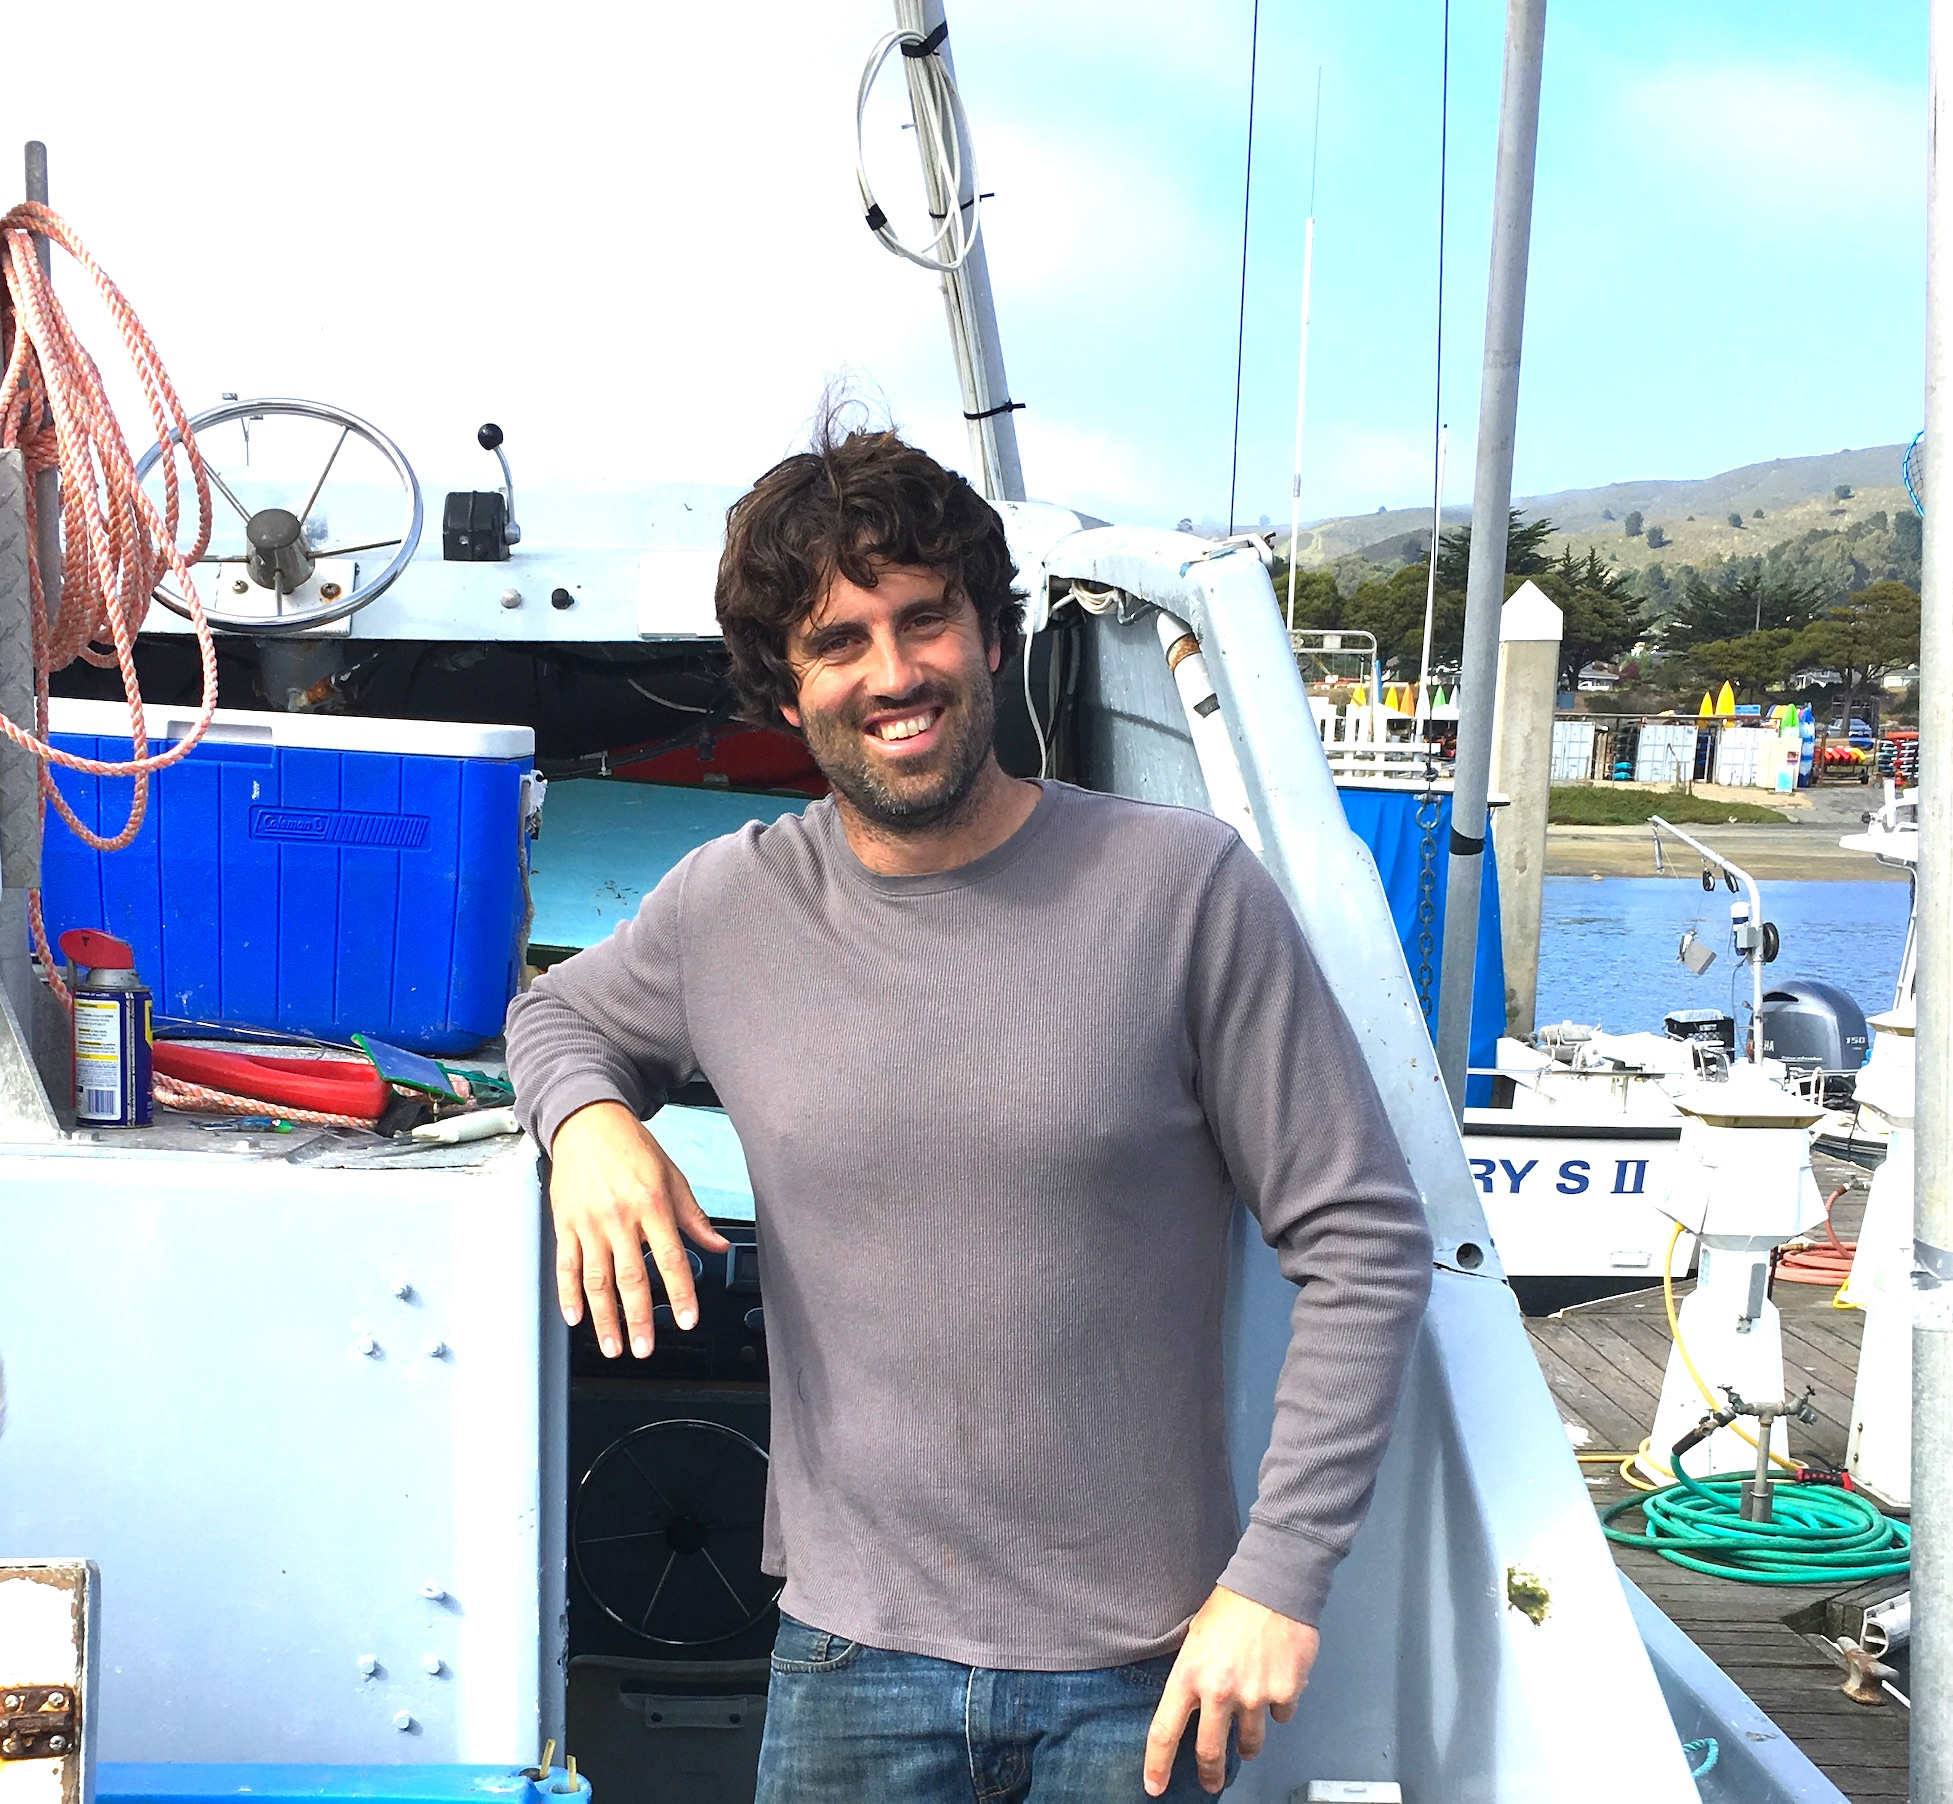 Commercial fisherman, Porter McHenry